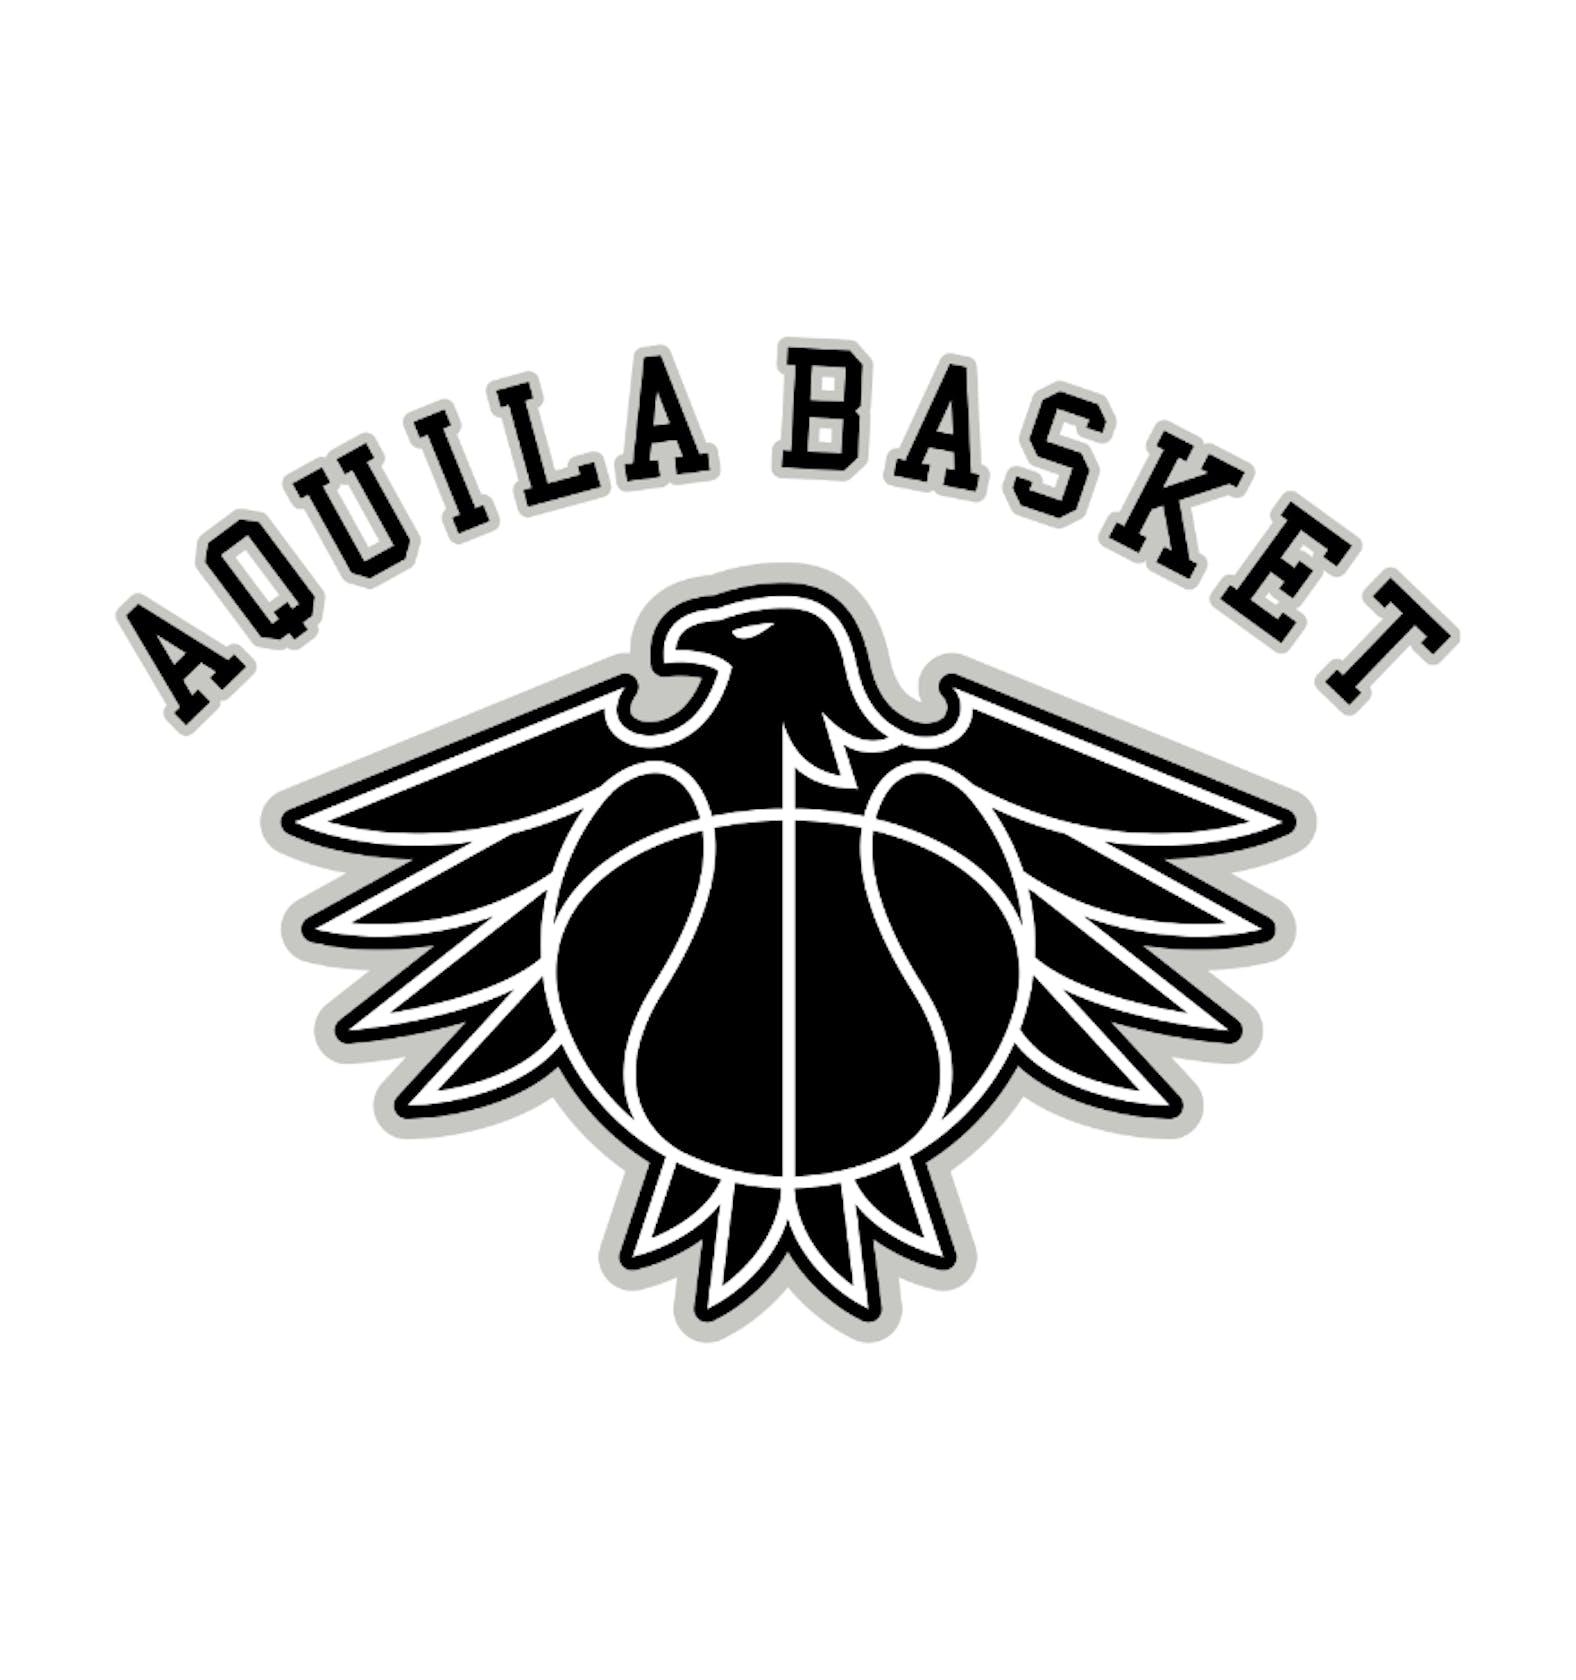 Aquila Basket official website